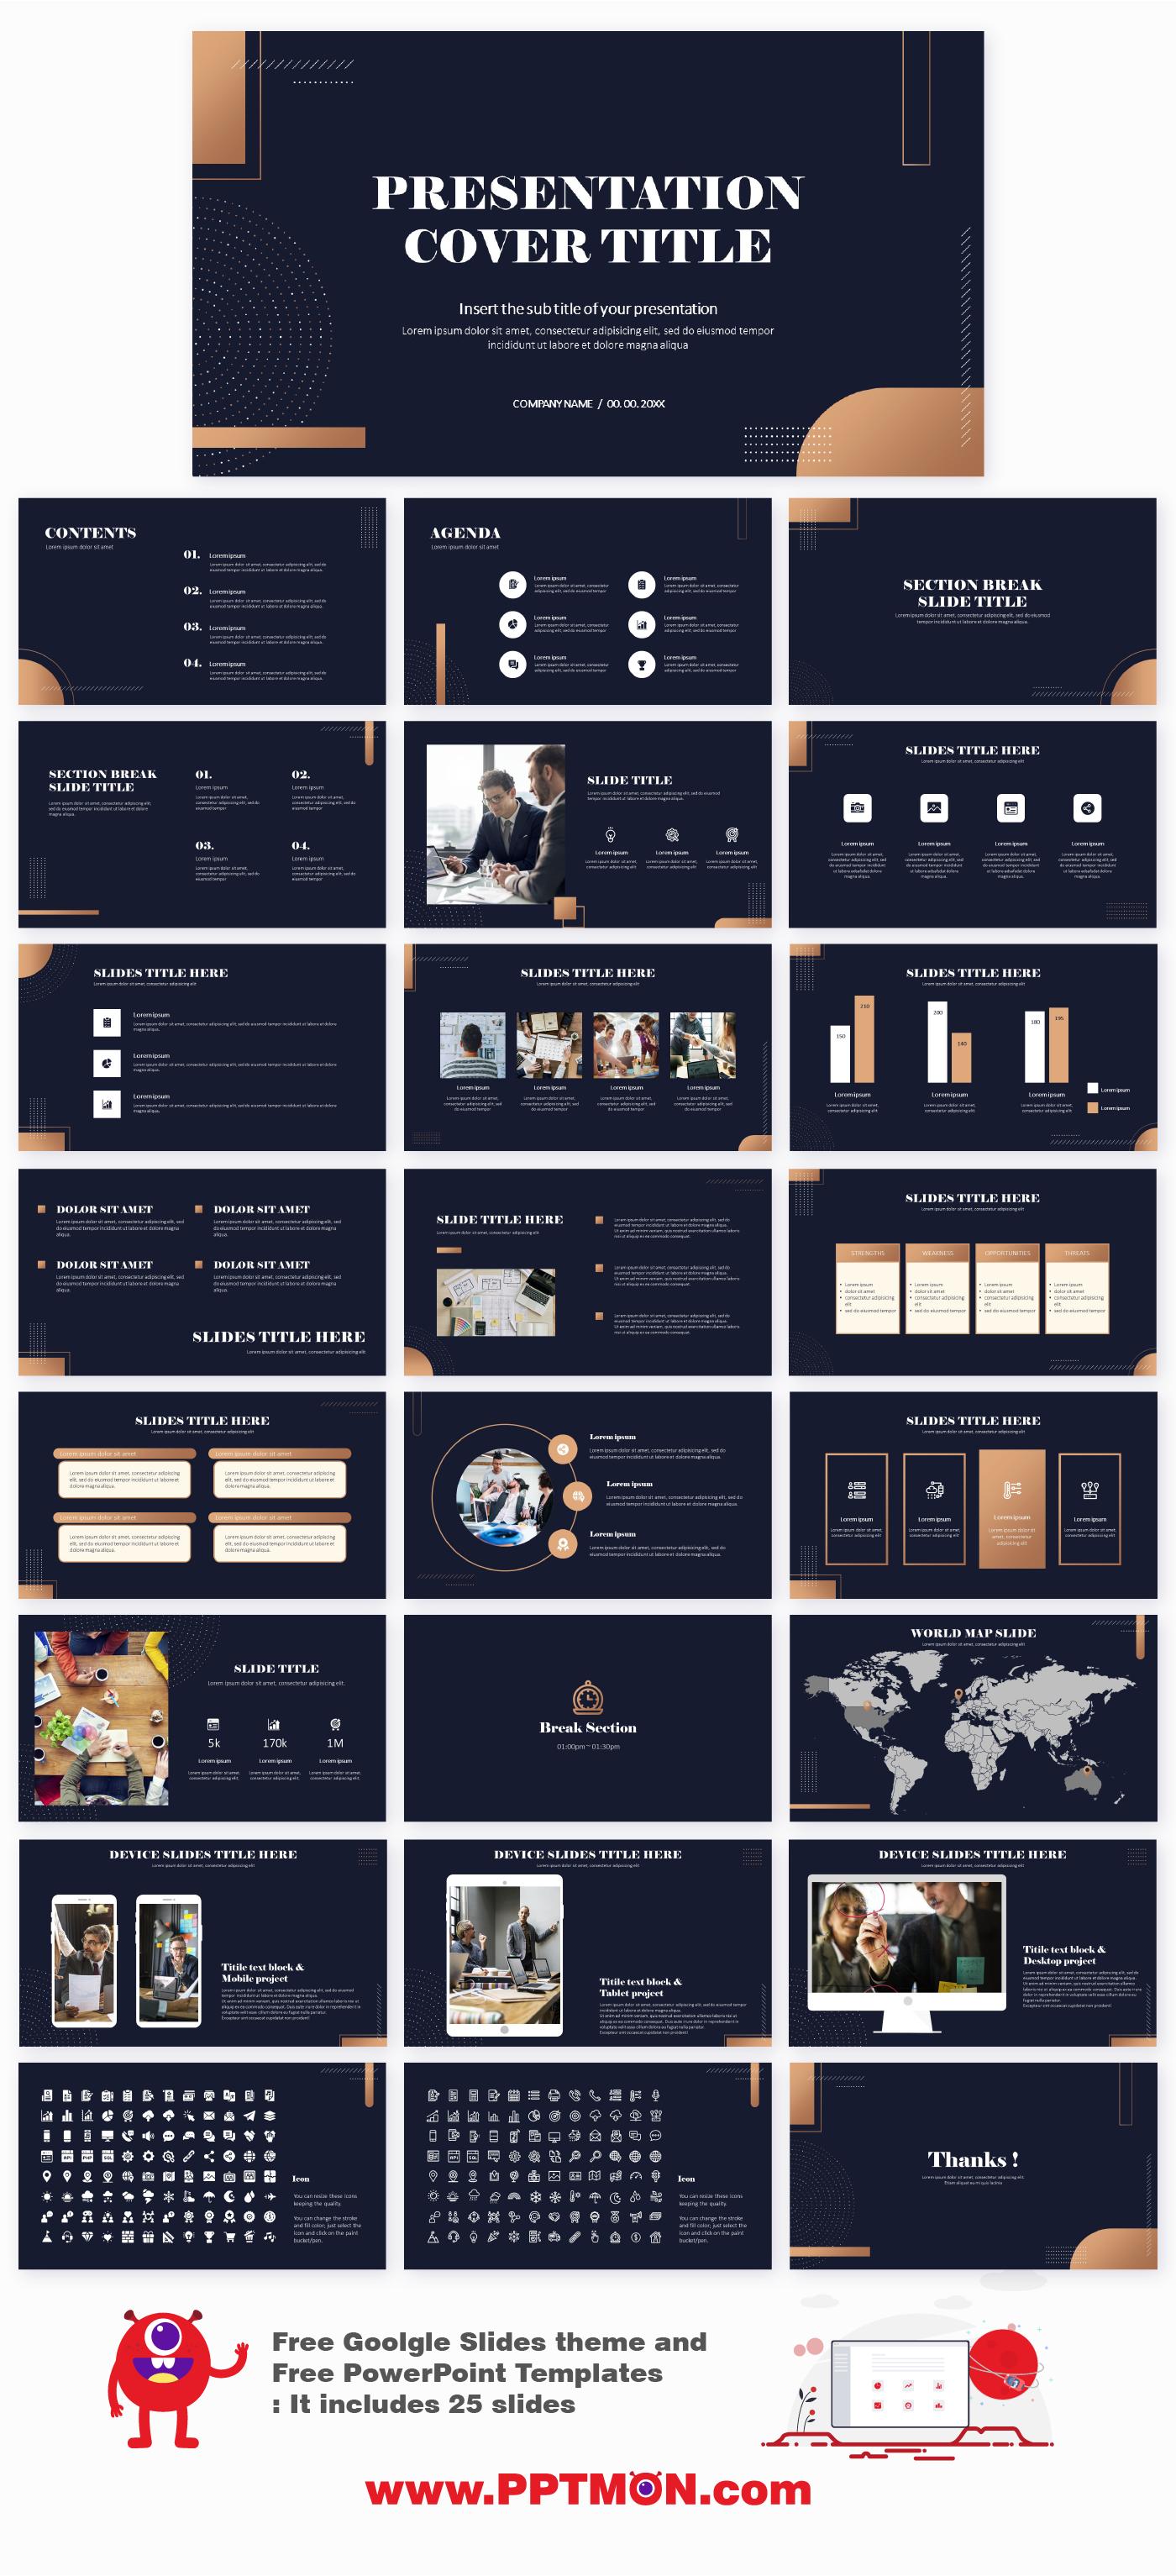 Modern Minimalist Free Presentation Templates Free Google Slides Theme And Powerp In 2020 Presentation Template Free Powerpoint Background Design Ppt Template Design